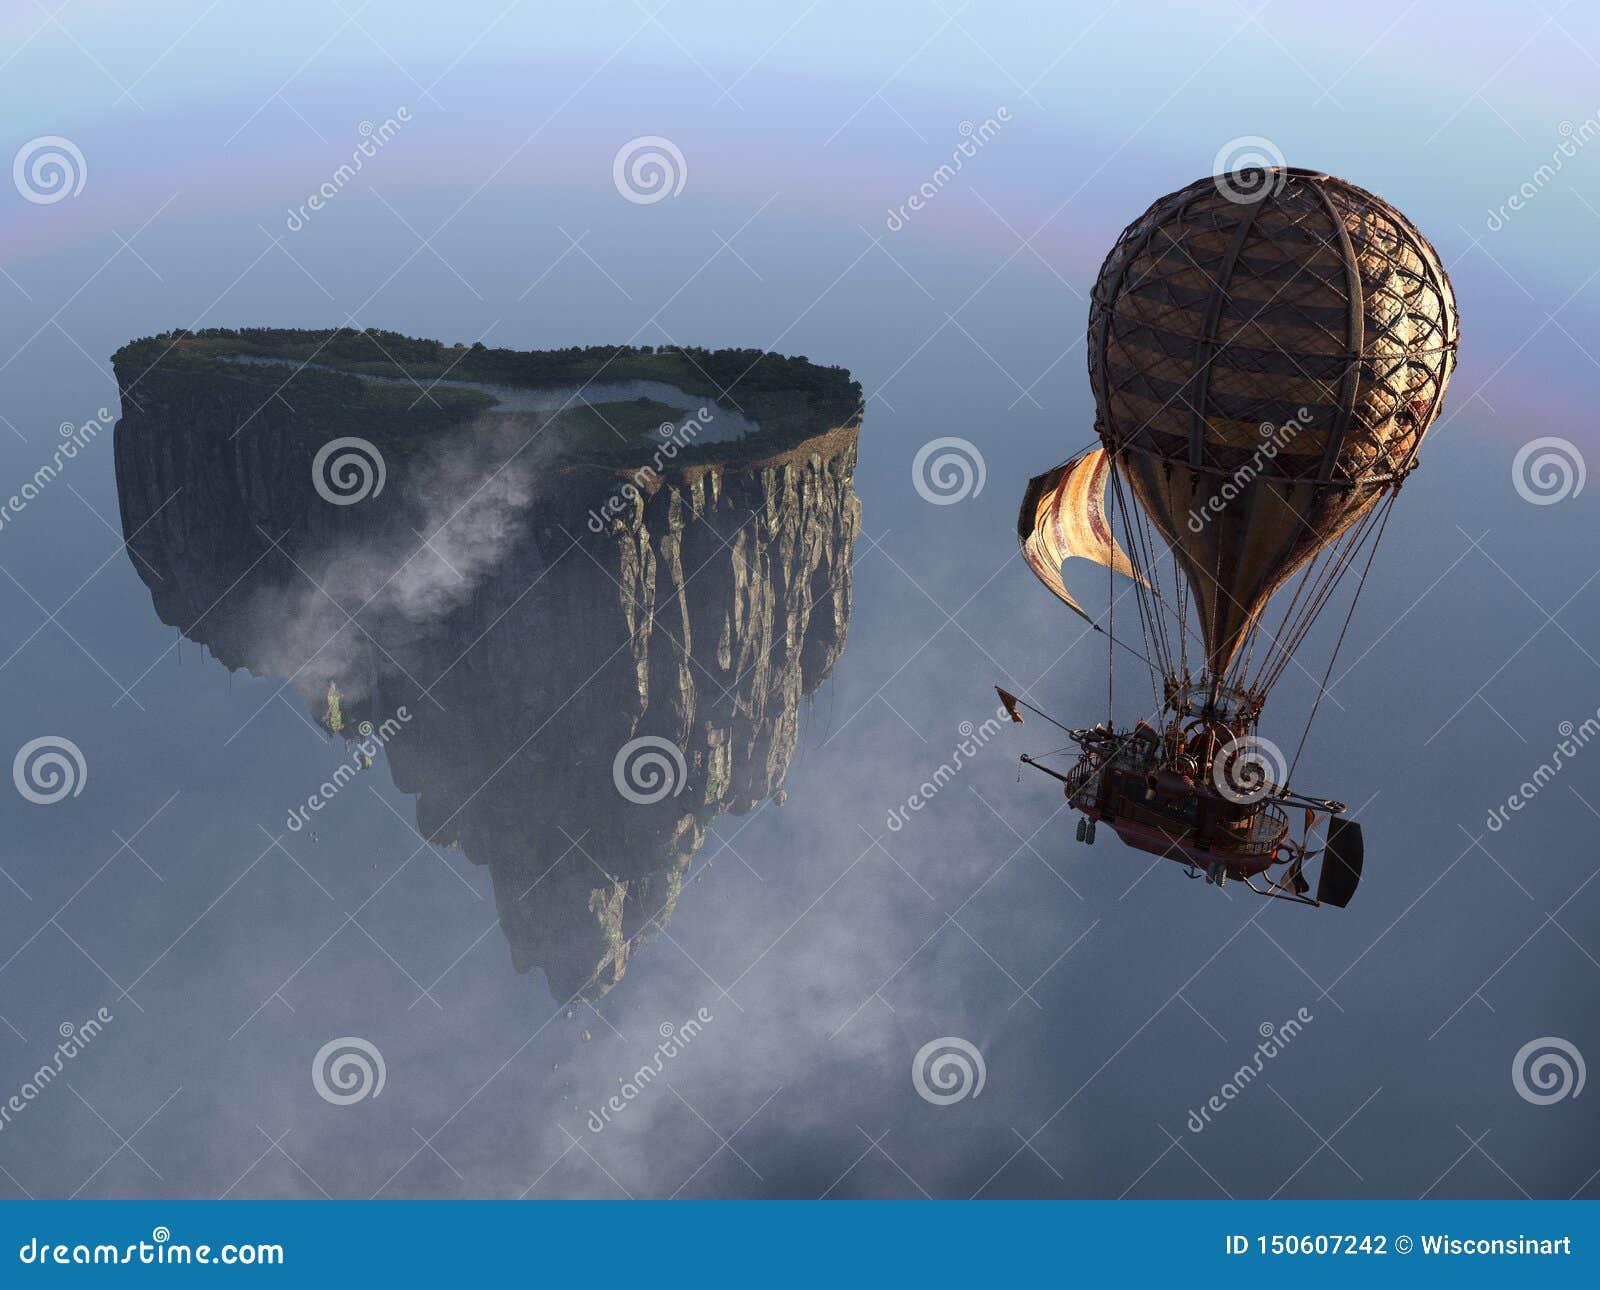 Fantasy Steampunk Floating Island Balloon